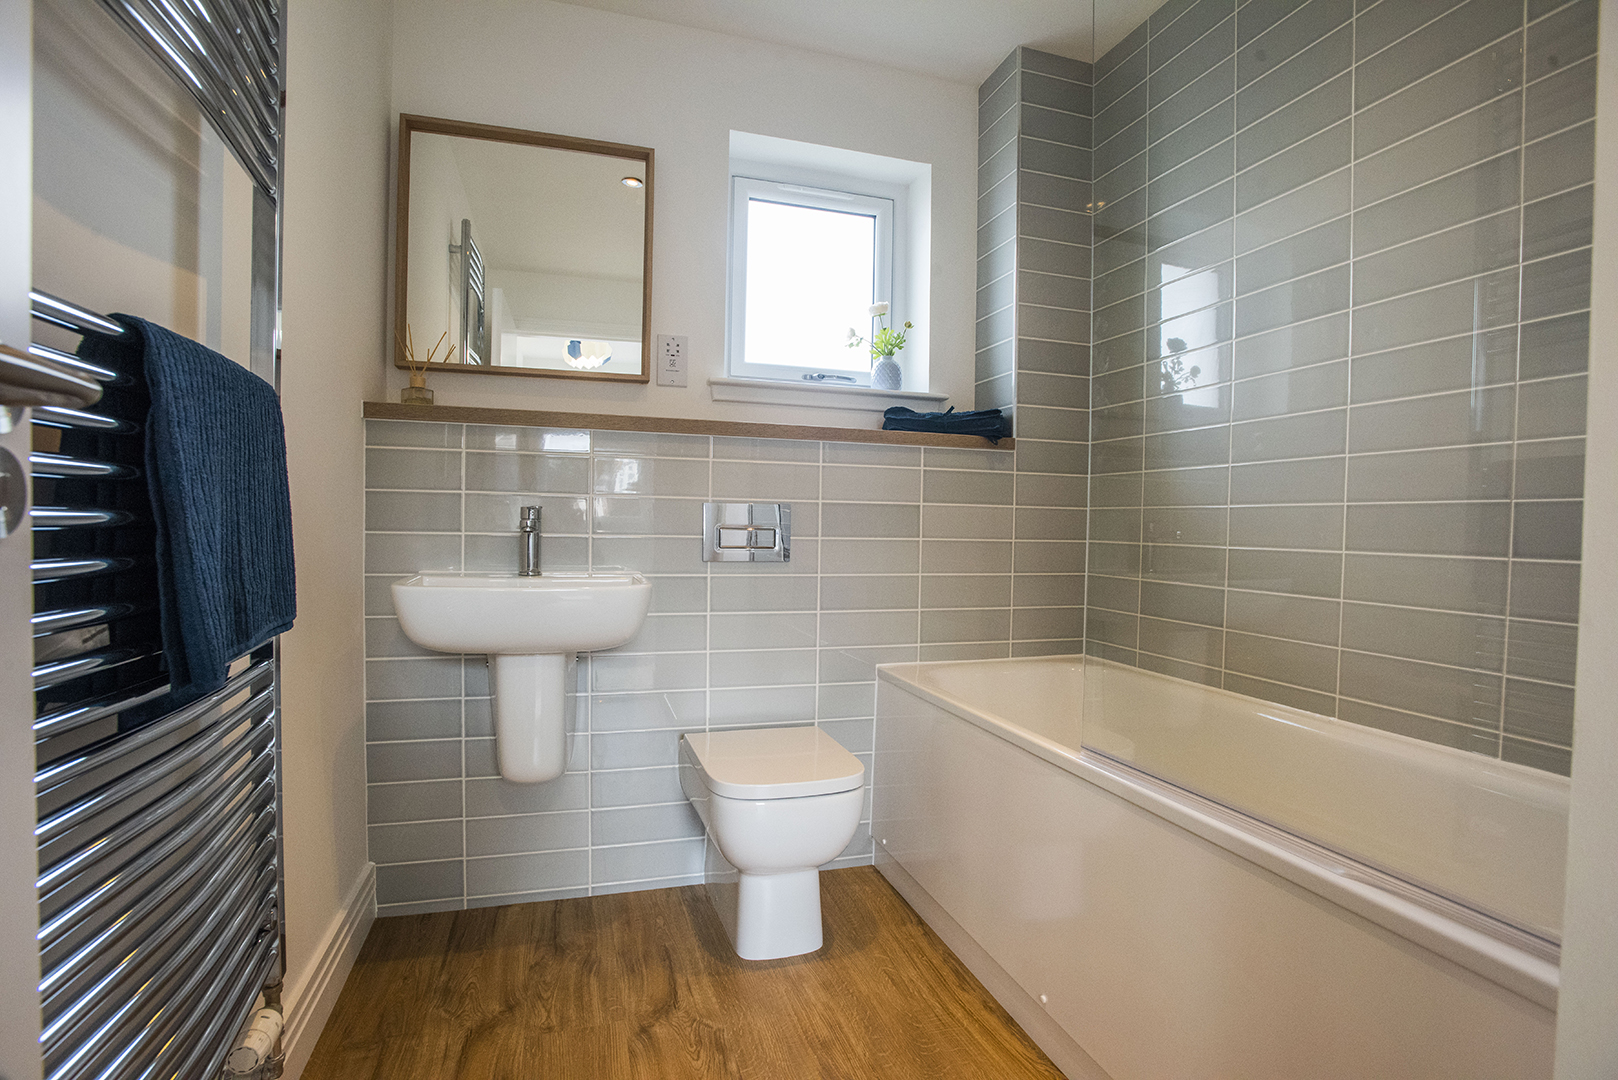 A bathroom with toilet, bath, sink and towel warmer